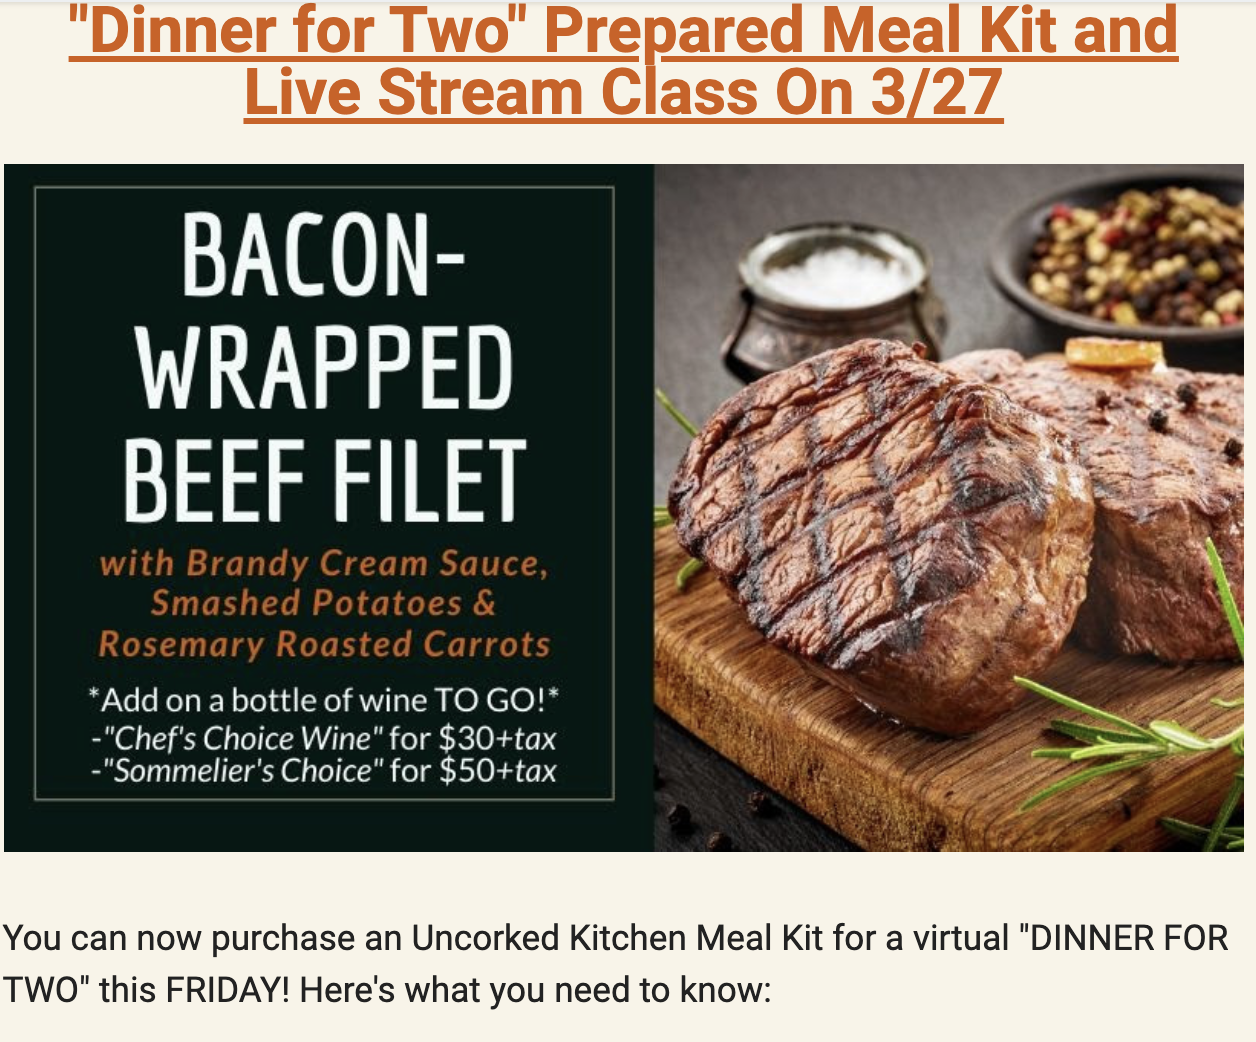 Restaurant online cooking classes